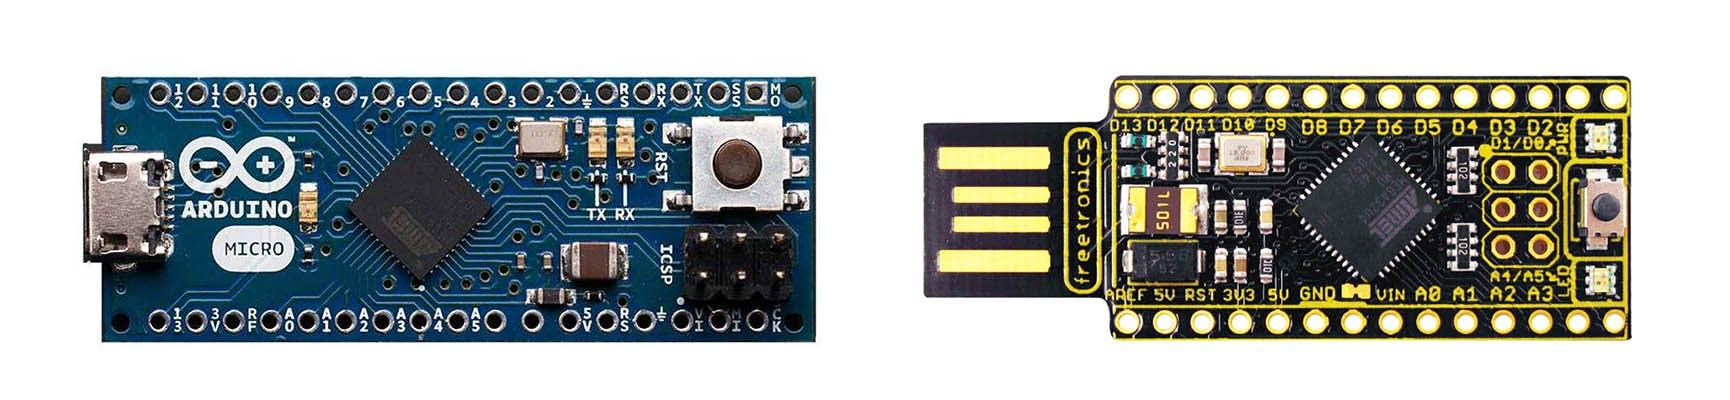 Arduino Micro vs Freetronics LeoStick (to scale)